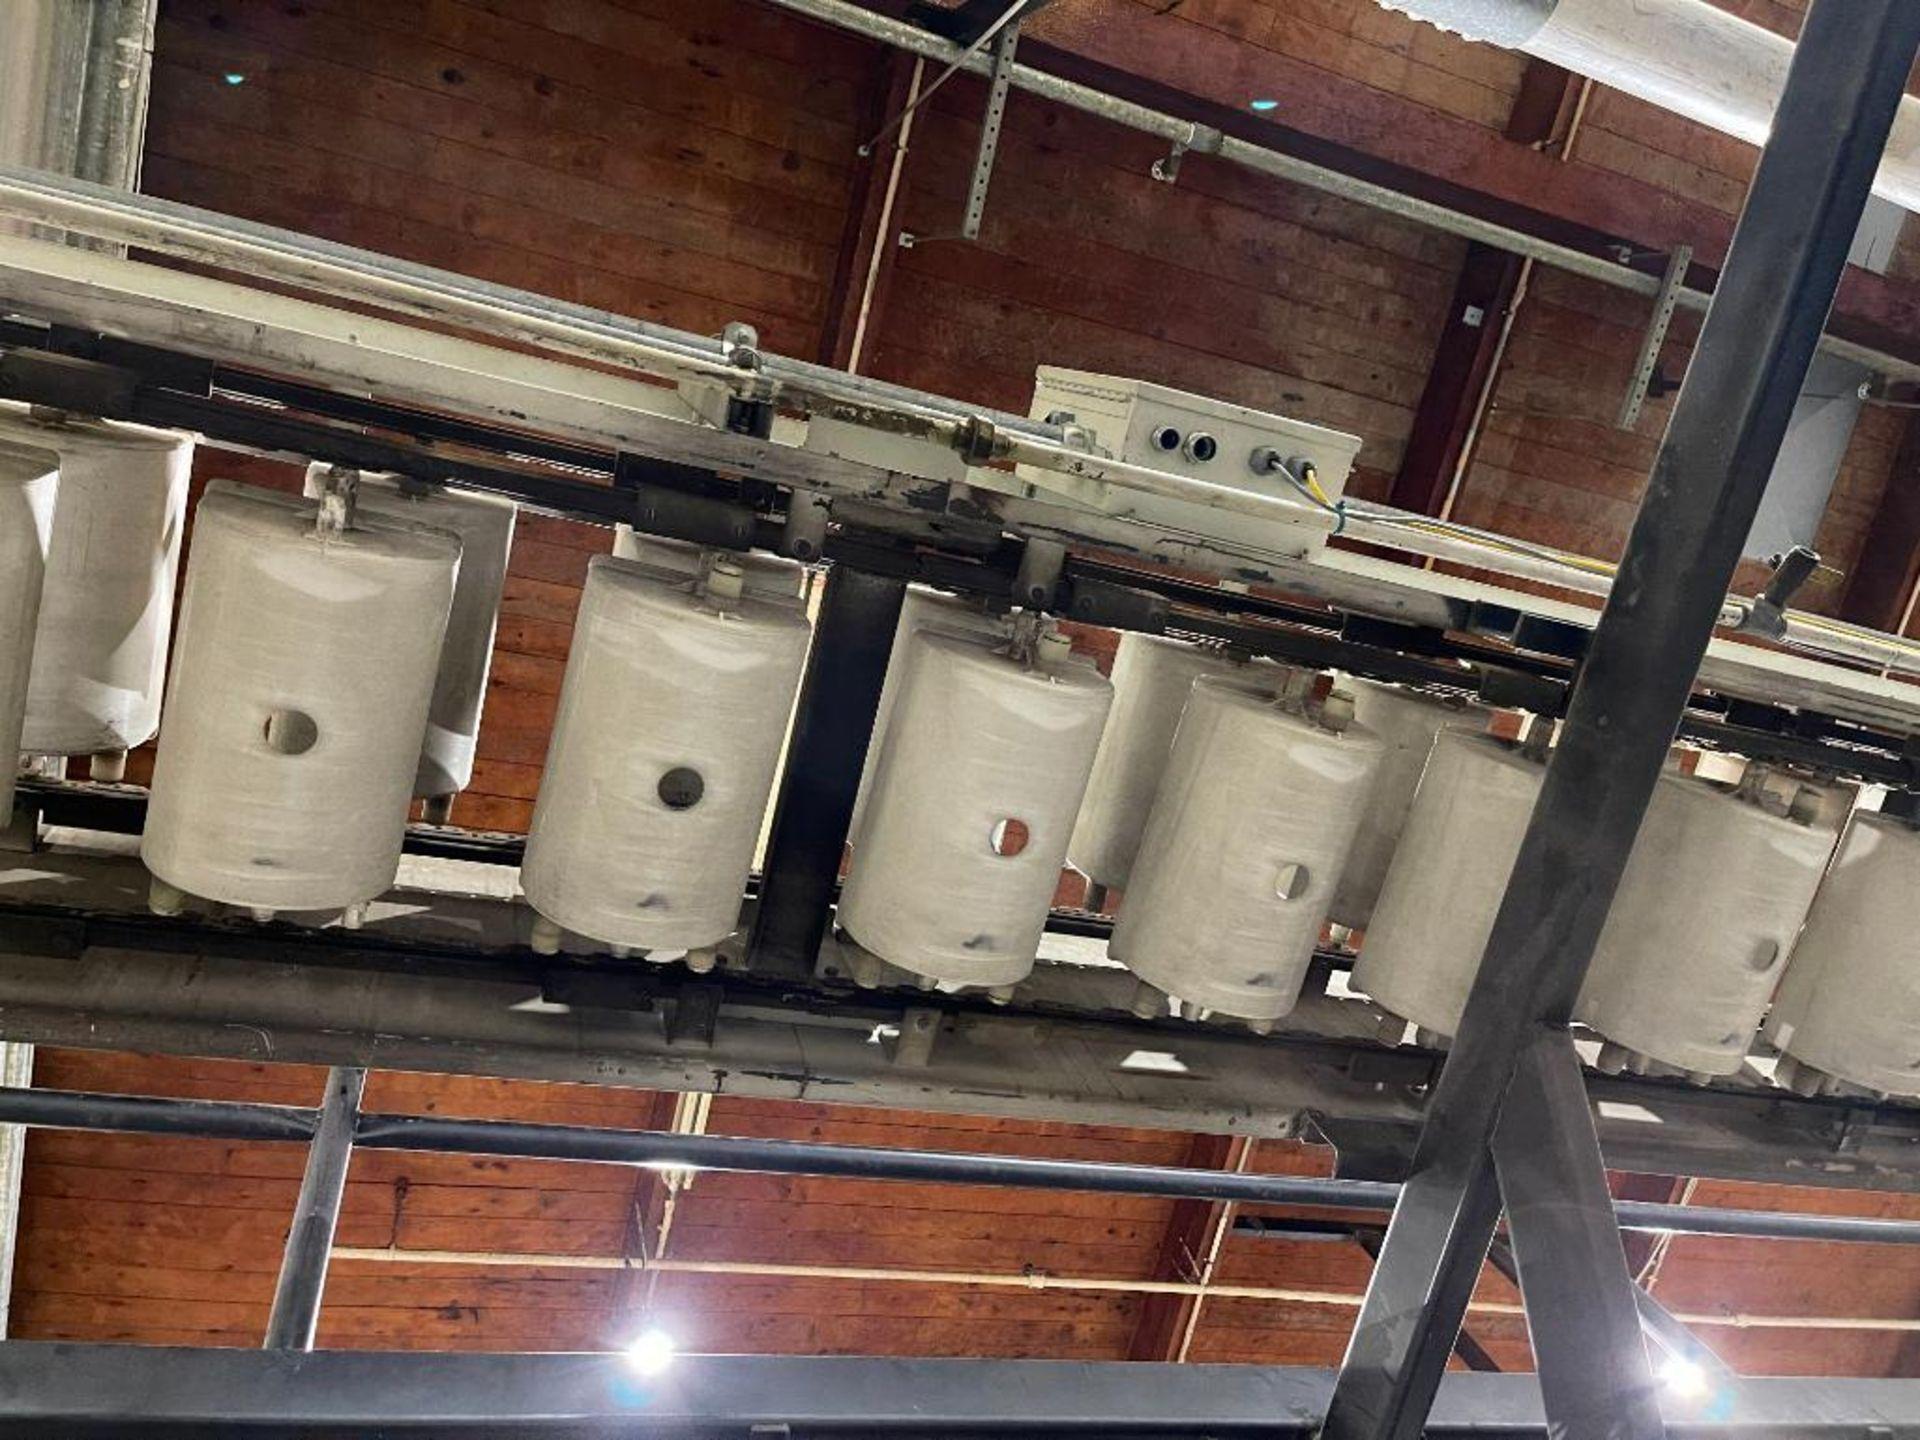 Meyer horizontal bucket elevator, model PC-072-12-BCC - Image 12 of 18